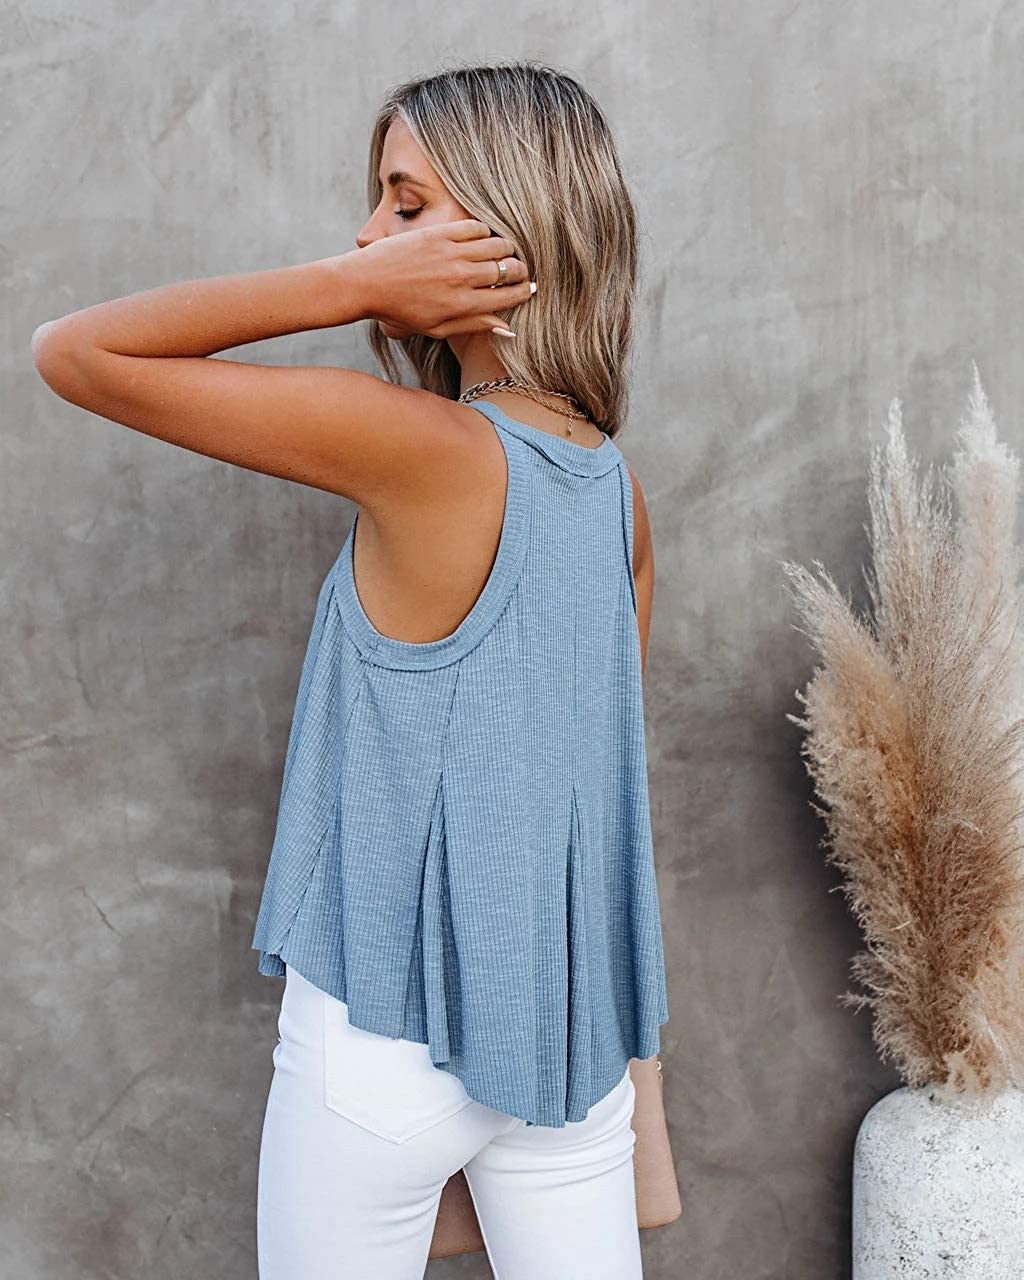 CHYRII Women's Casual Halter V Neck Asymmestric Tank Tops Summer Sleeveless Cami Shirts